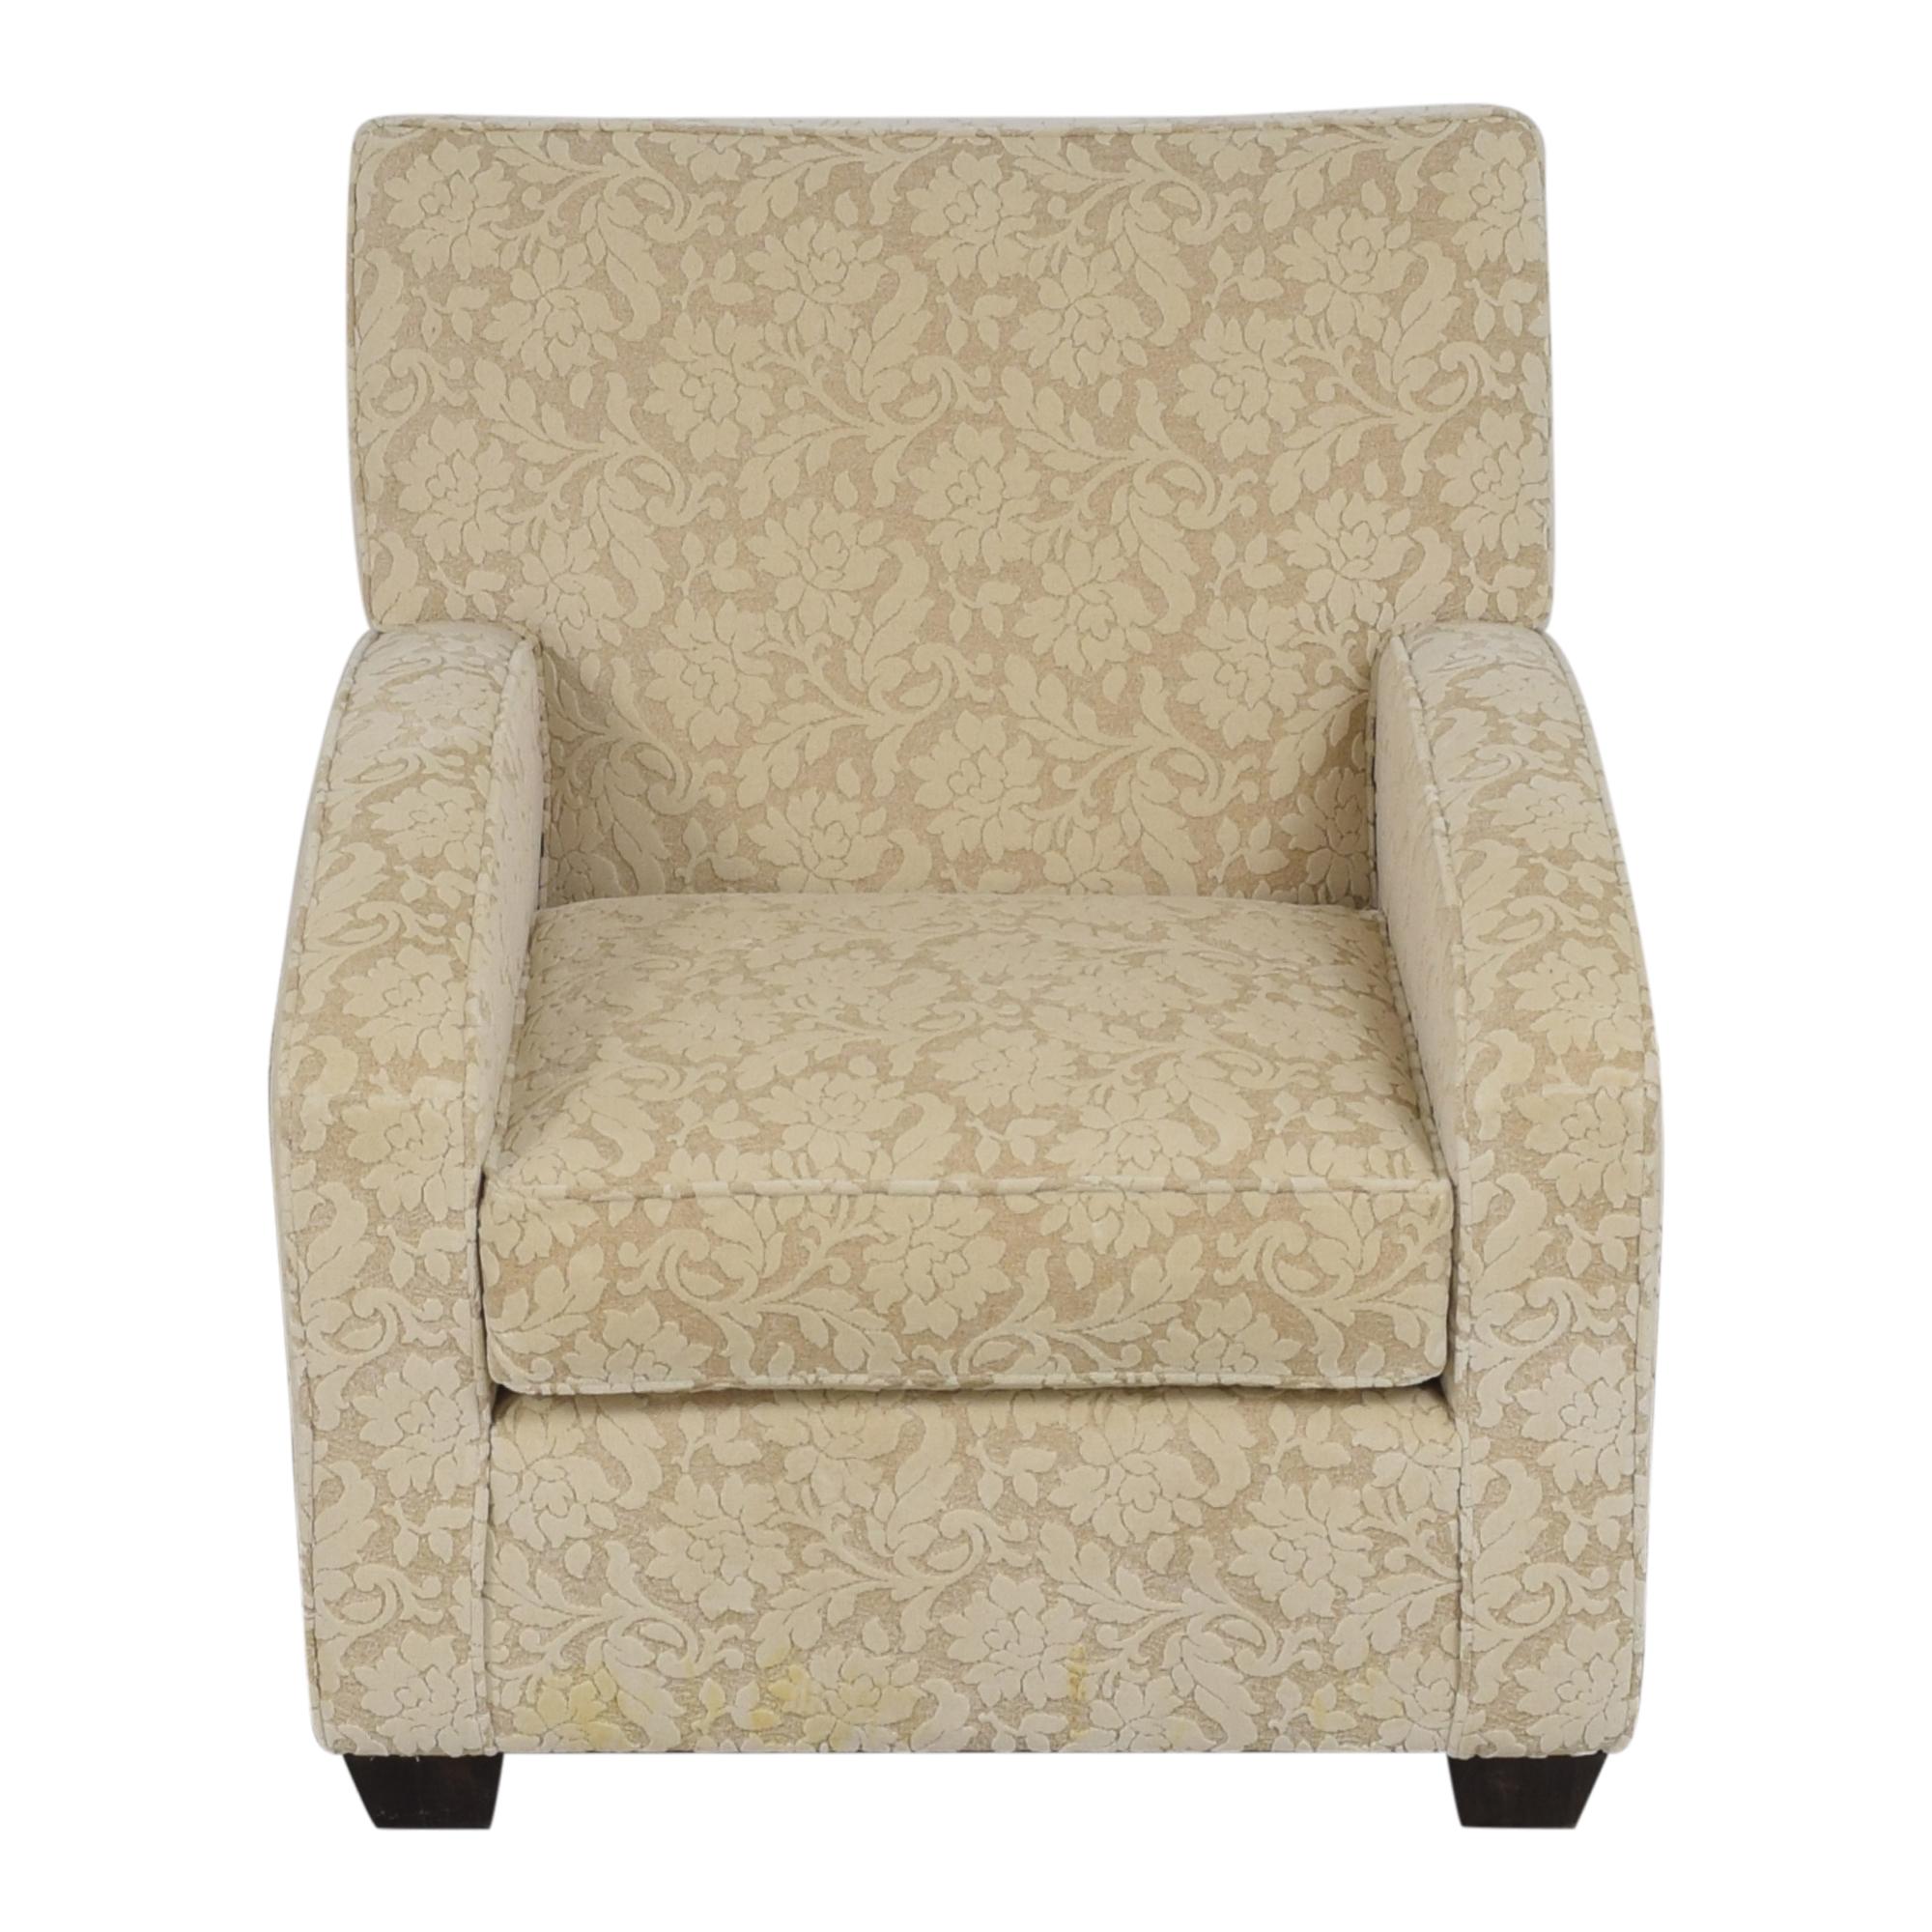 buy Ethan Allen Arc Chair Ethan Allen Chairs